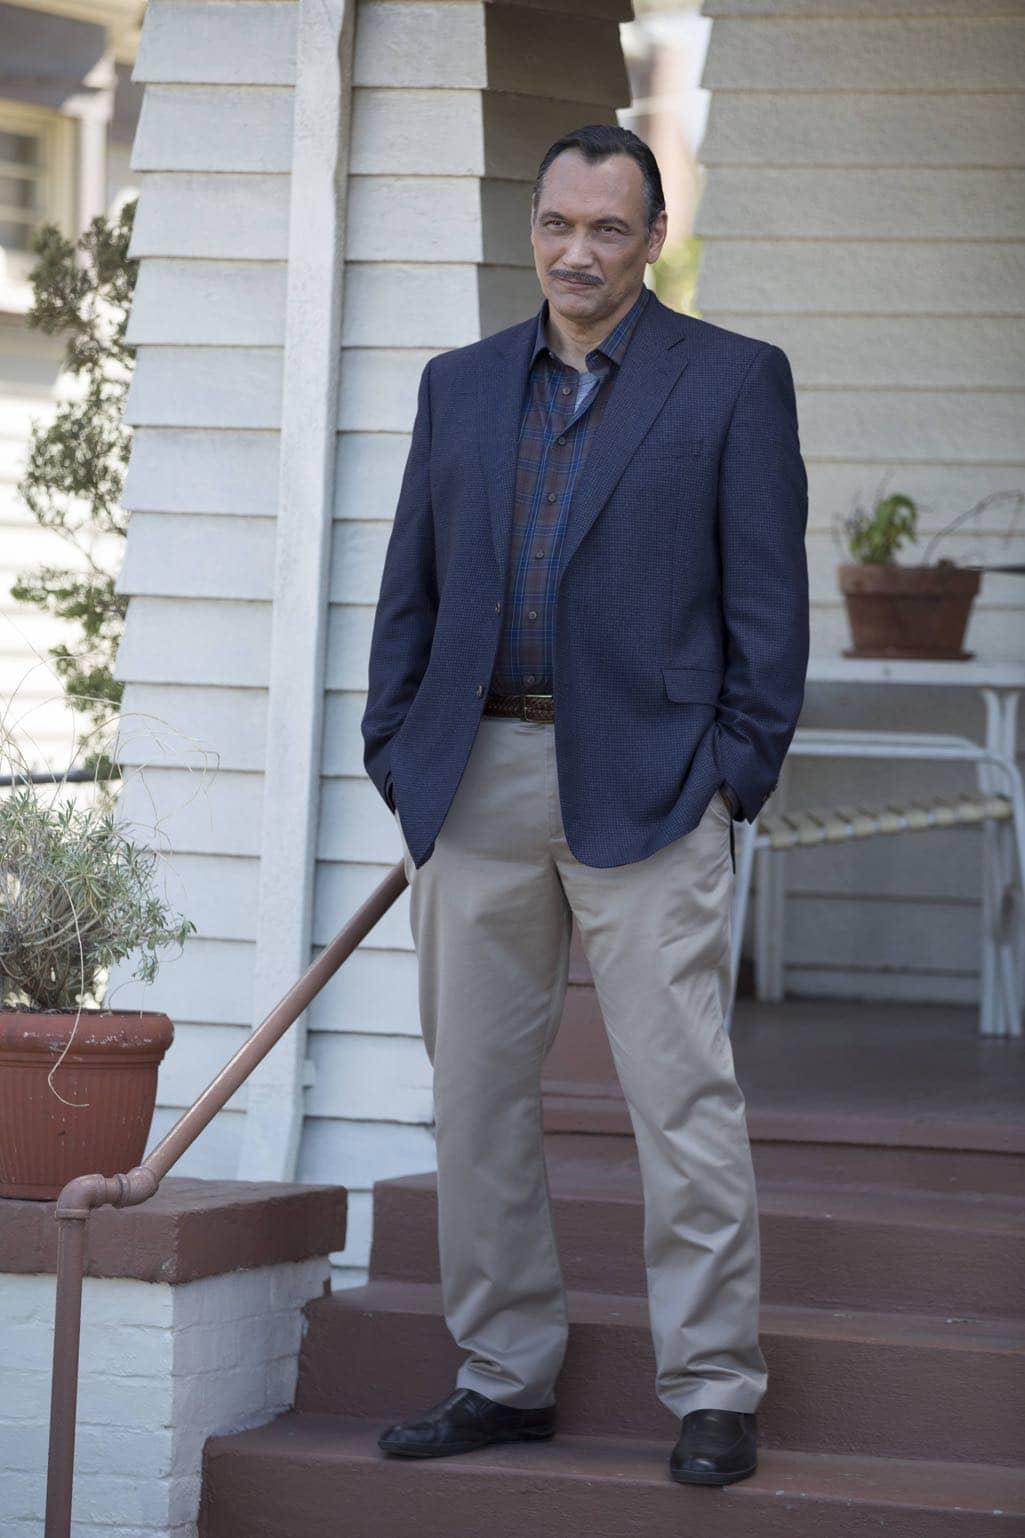 "BROOKLYN NINE-NINE: Guest star Jimmy Smits in the ""Mr. Santiago"" episode of BROOKLYN NINE-NINE airing Tuesday, Nov. 22 (8:00-8:31 PM ET/PT) on FOX.CR: John P Fleenor/FOX"